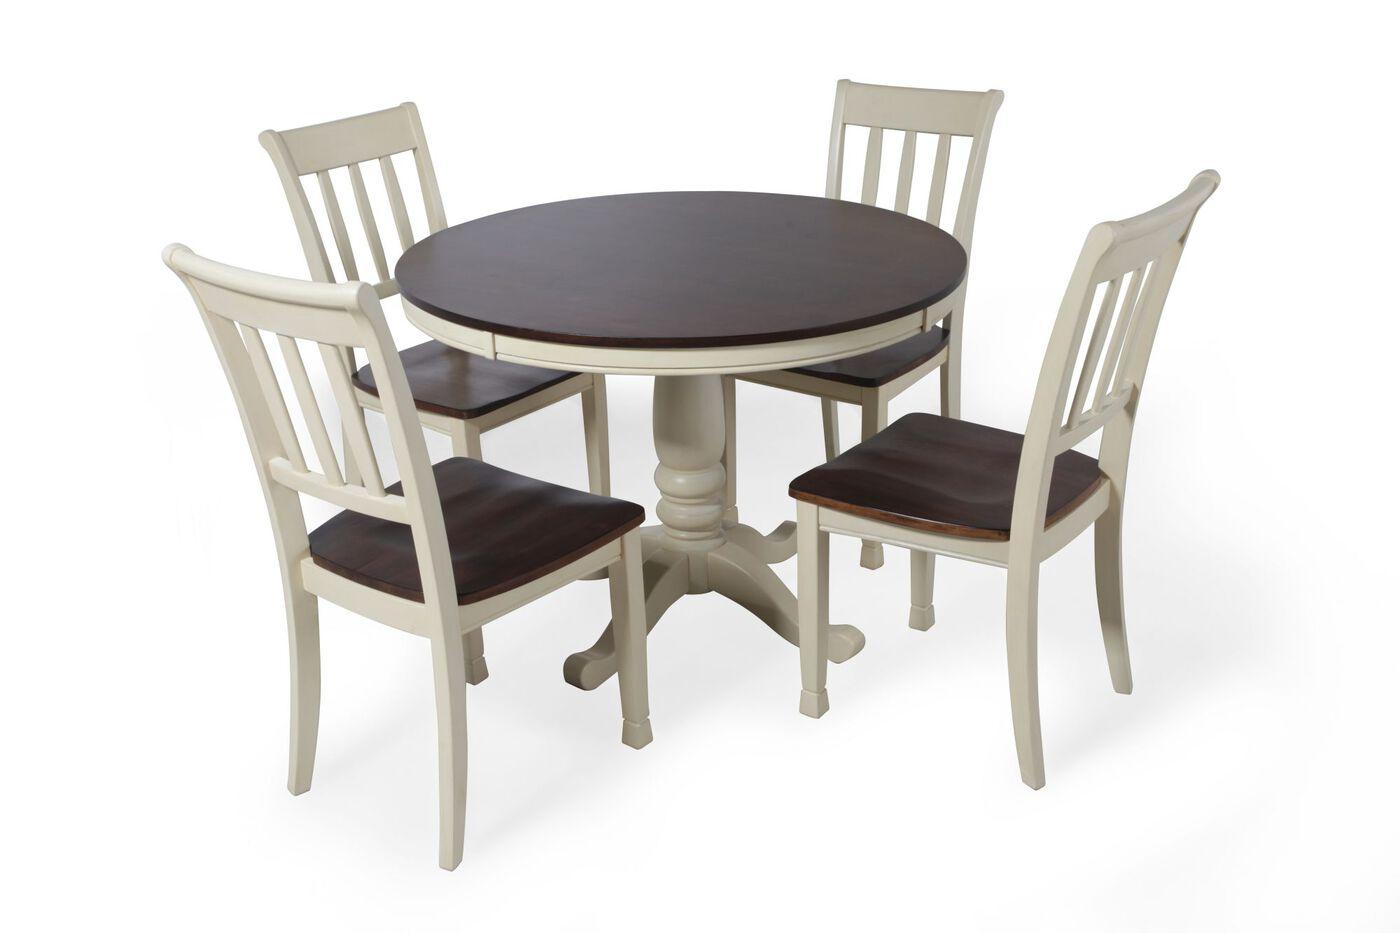 Ashley whitesburg cottage five piece dining set mathis for Olympic furniture kitchen set